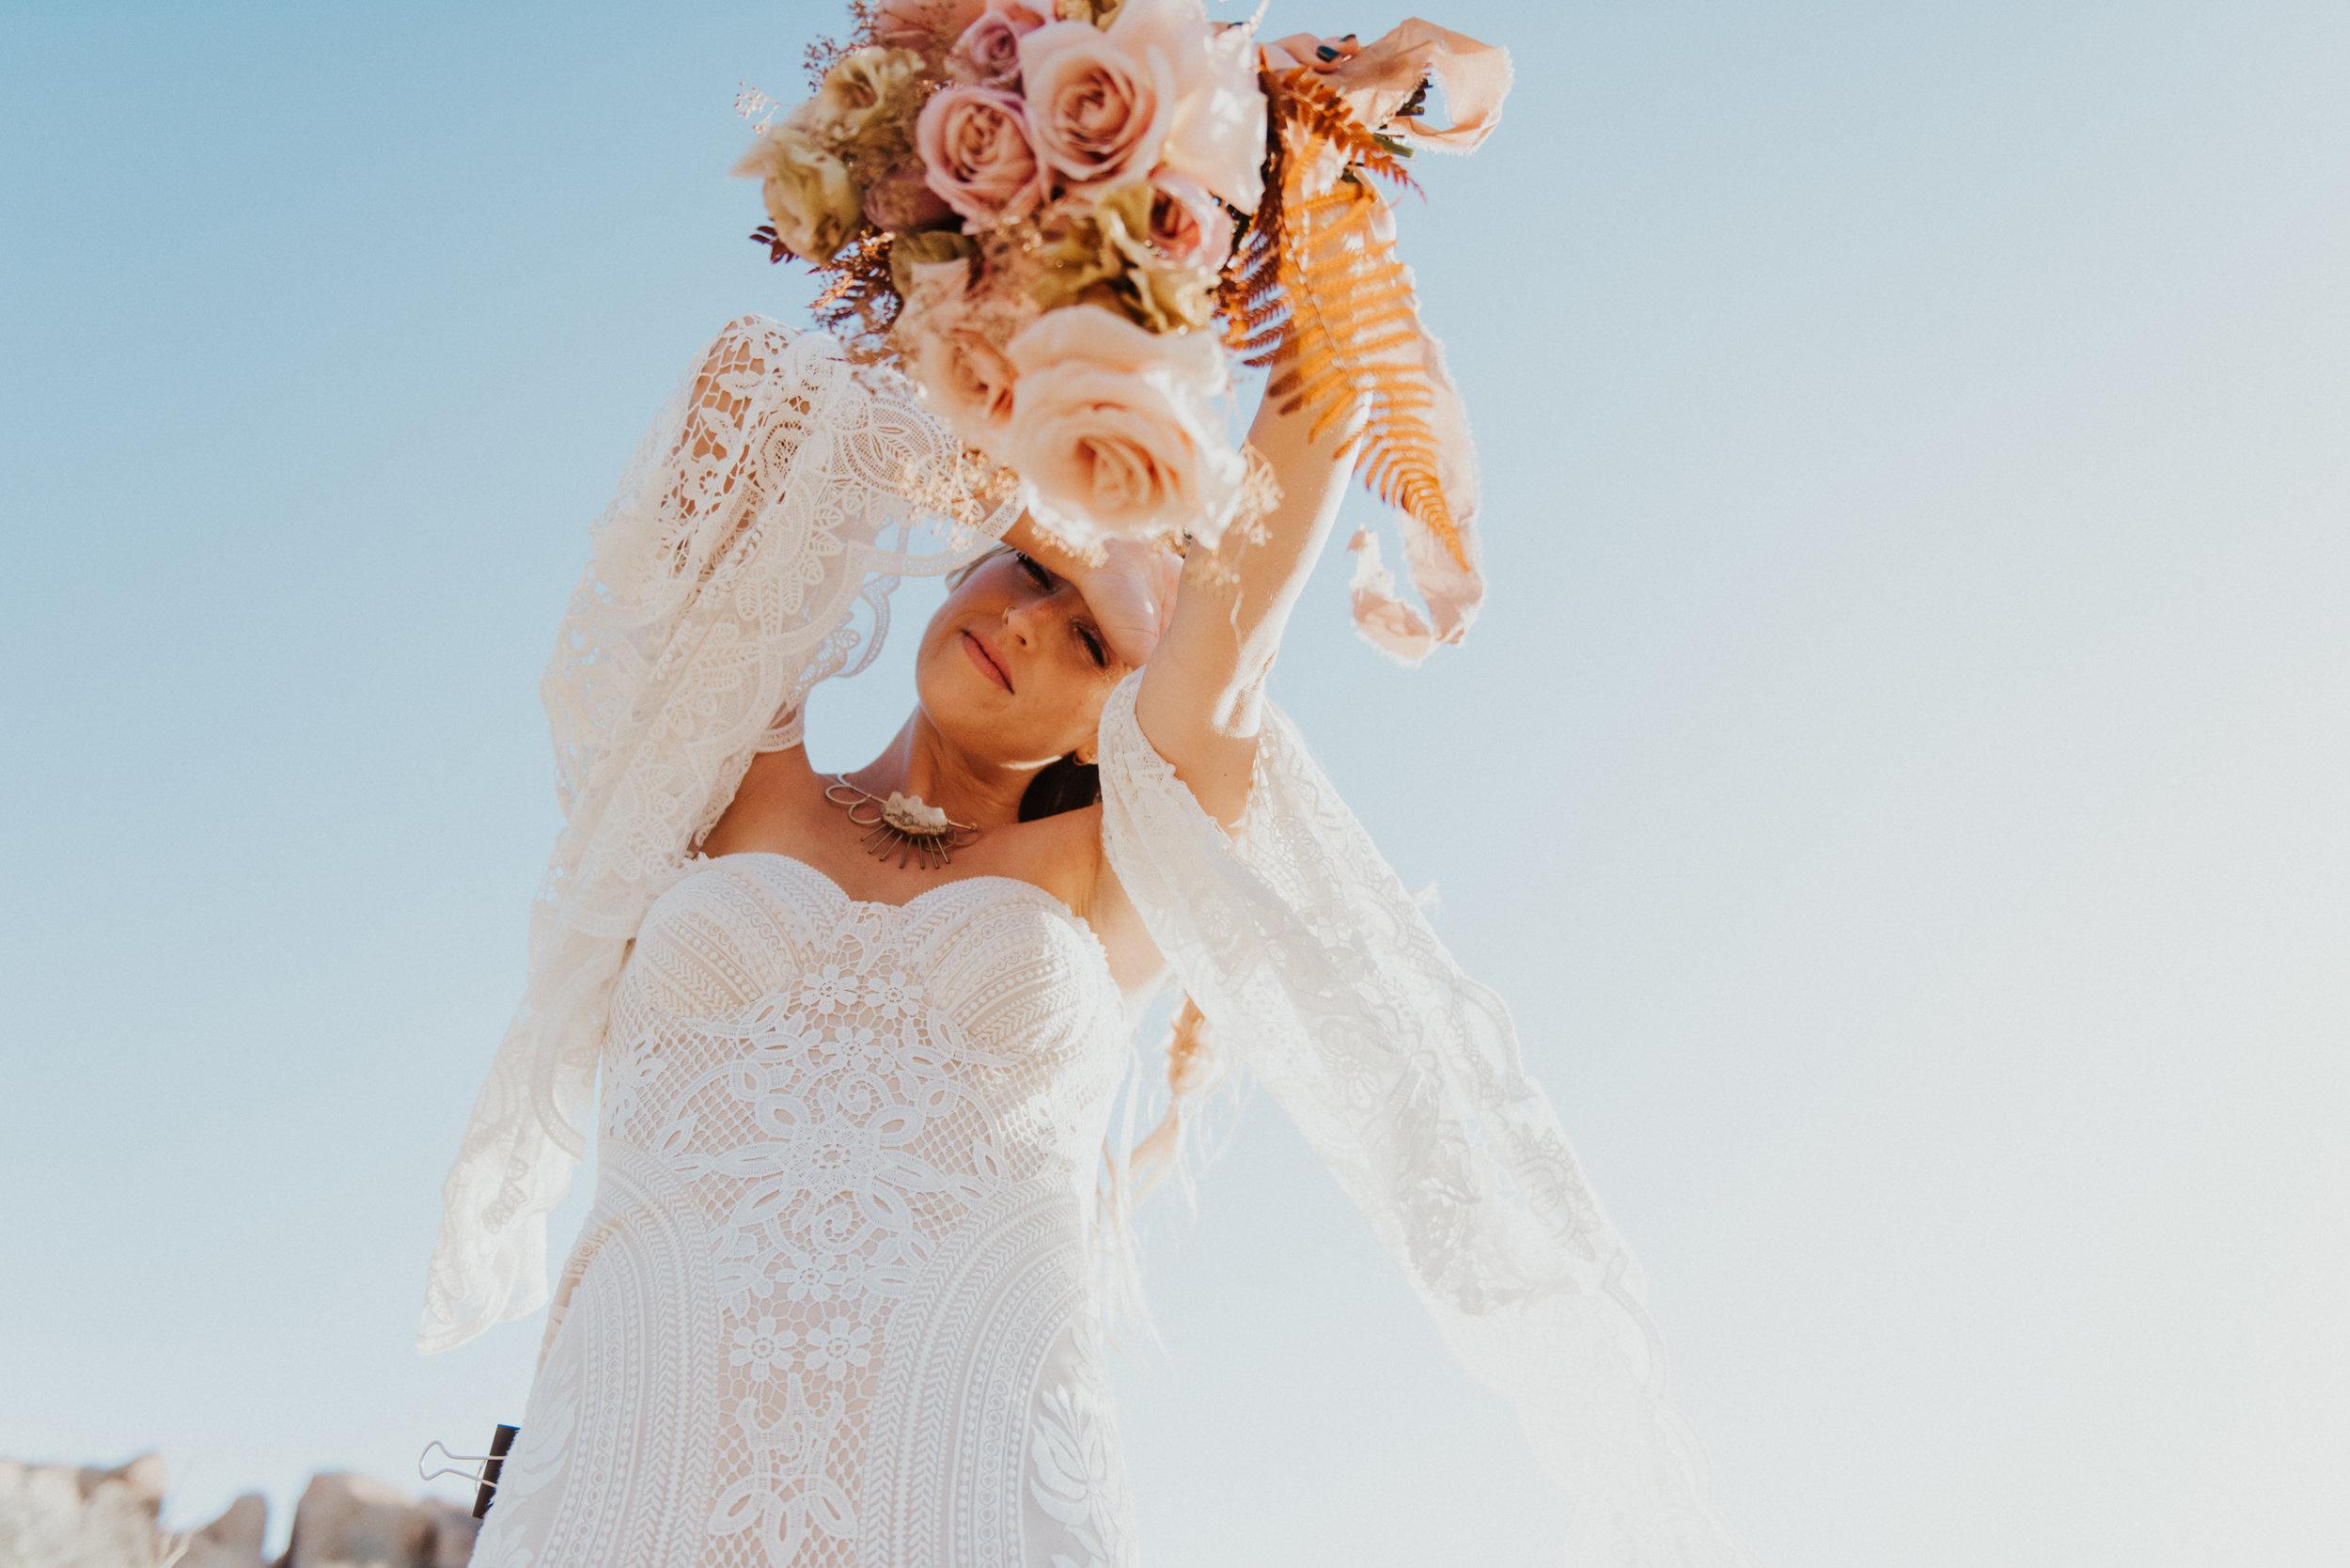 FortSt.John_photographer_TyraEPhotography_Wedding_Couple_Family_Photograhy_DawsonCreek_Elopement_Bride_Boduoir_Portraits-4940.jpg